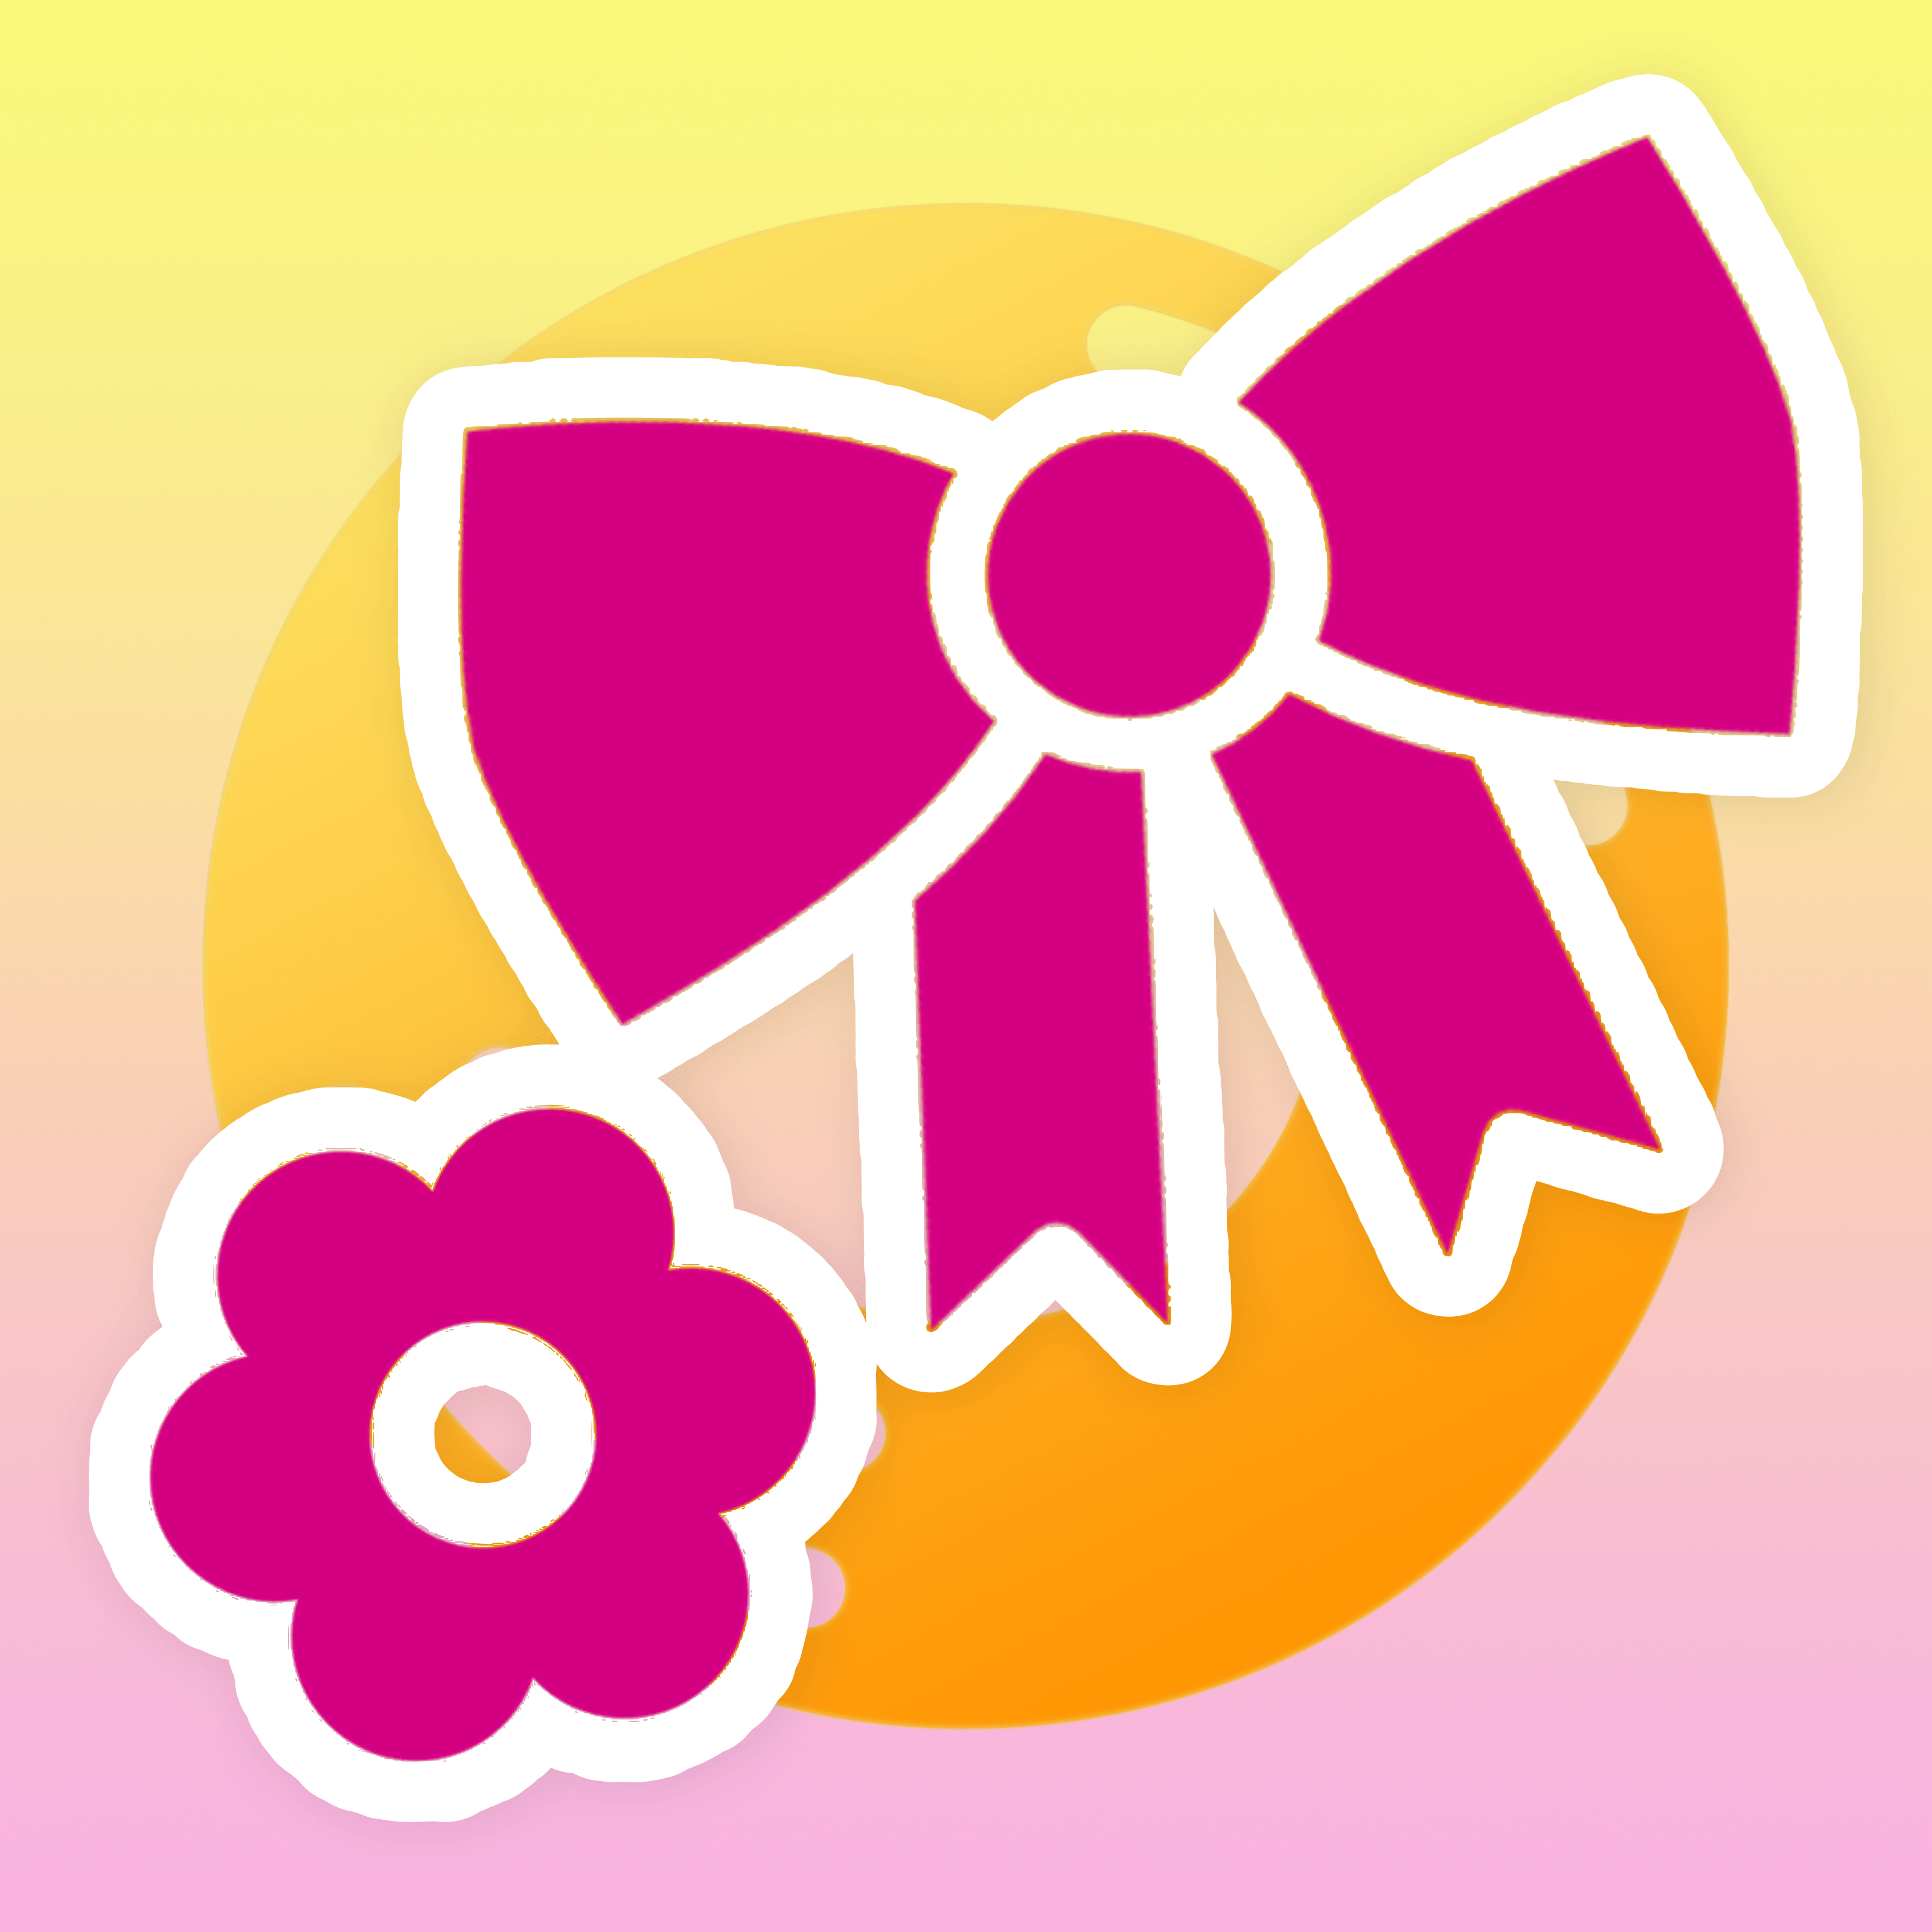 beepiestofboops avatar